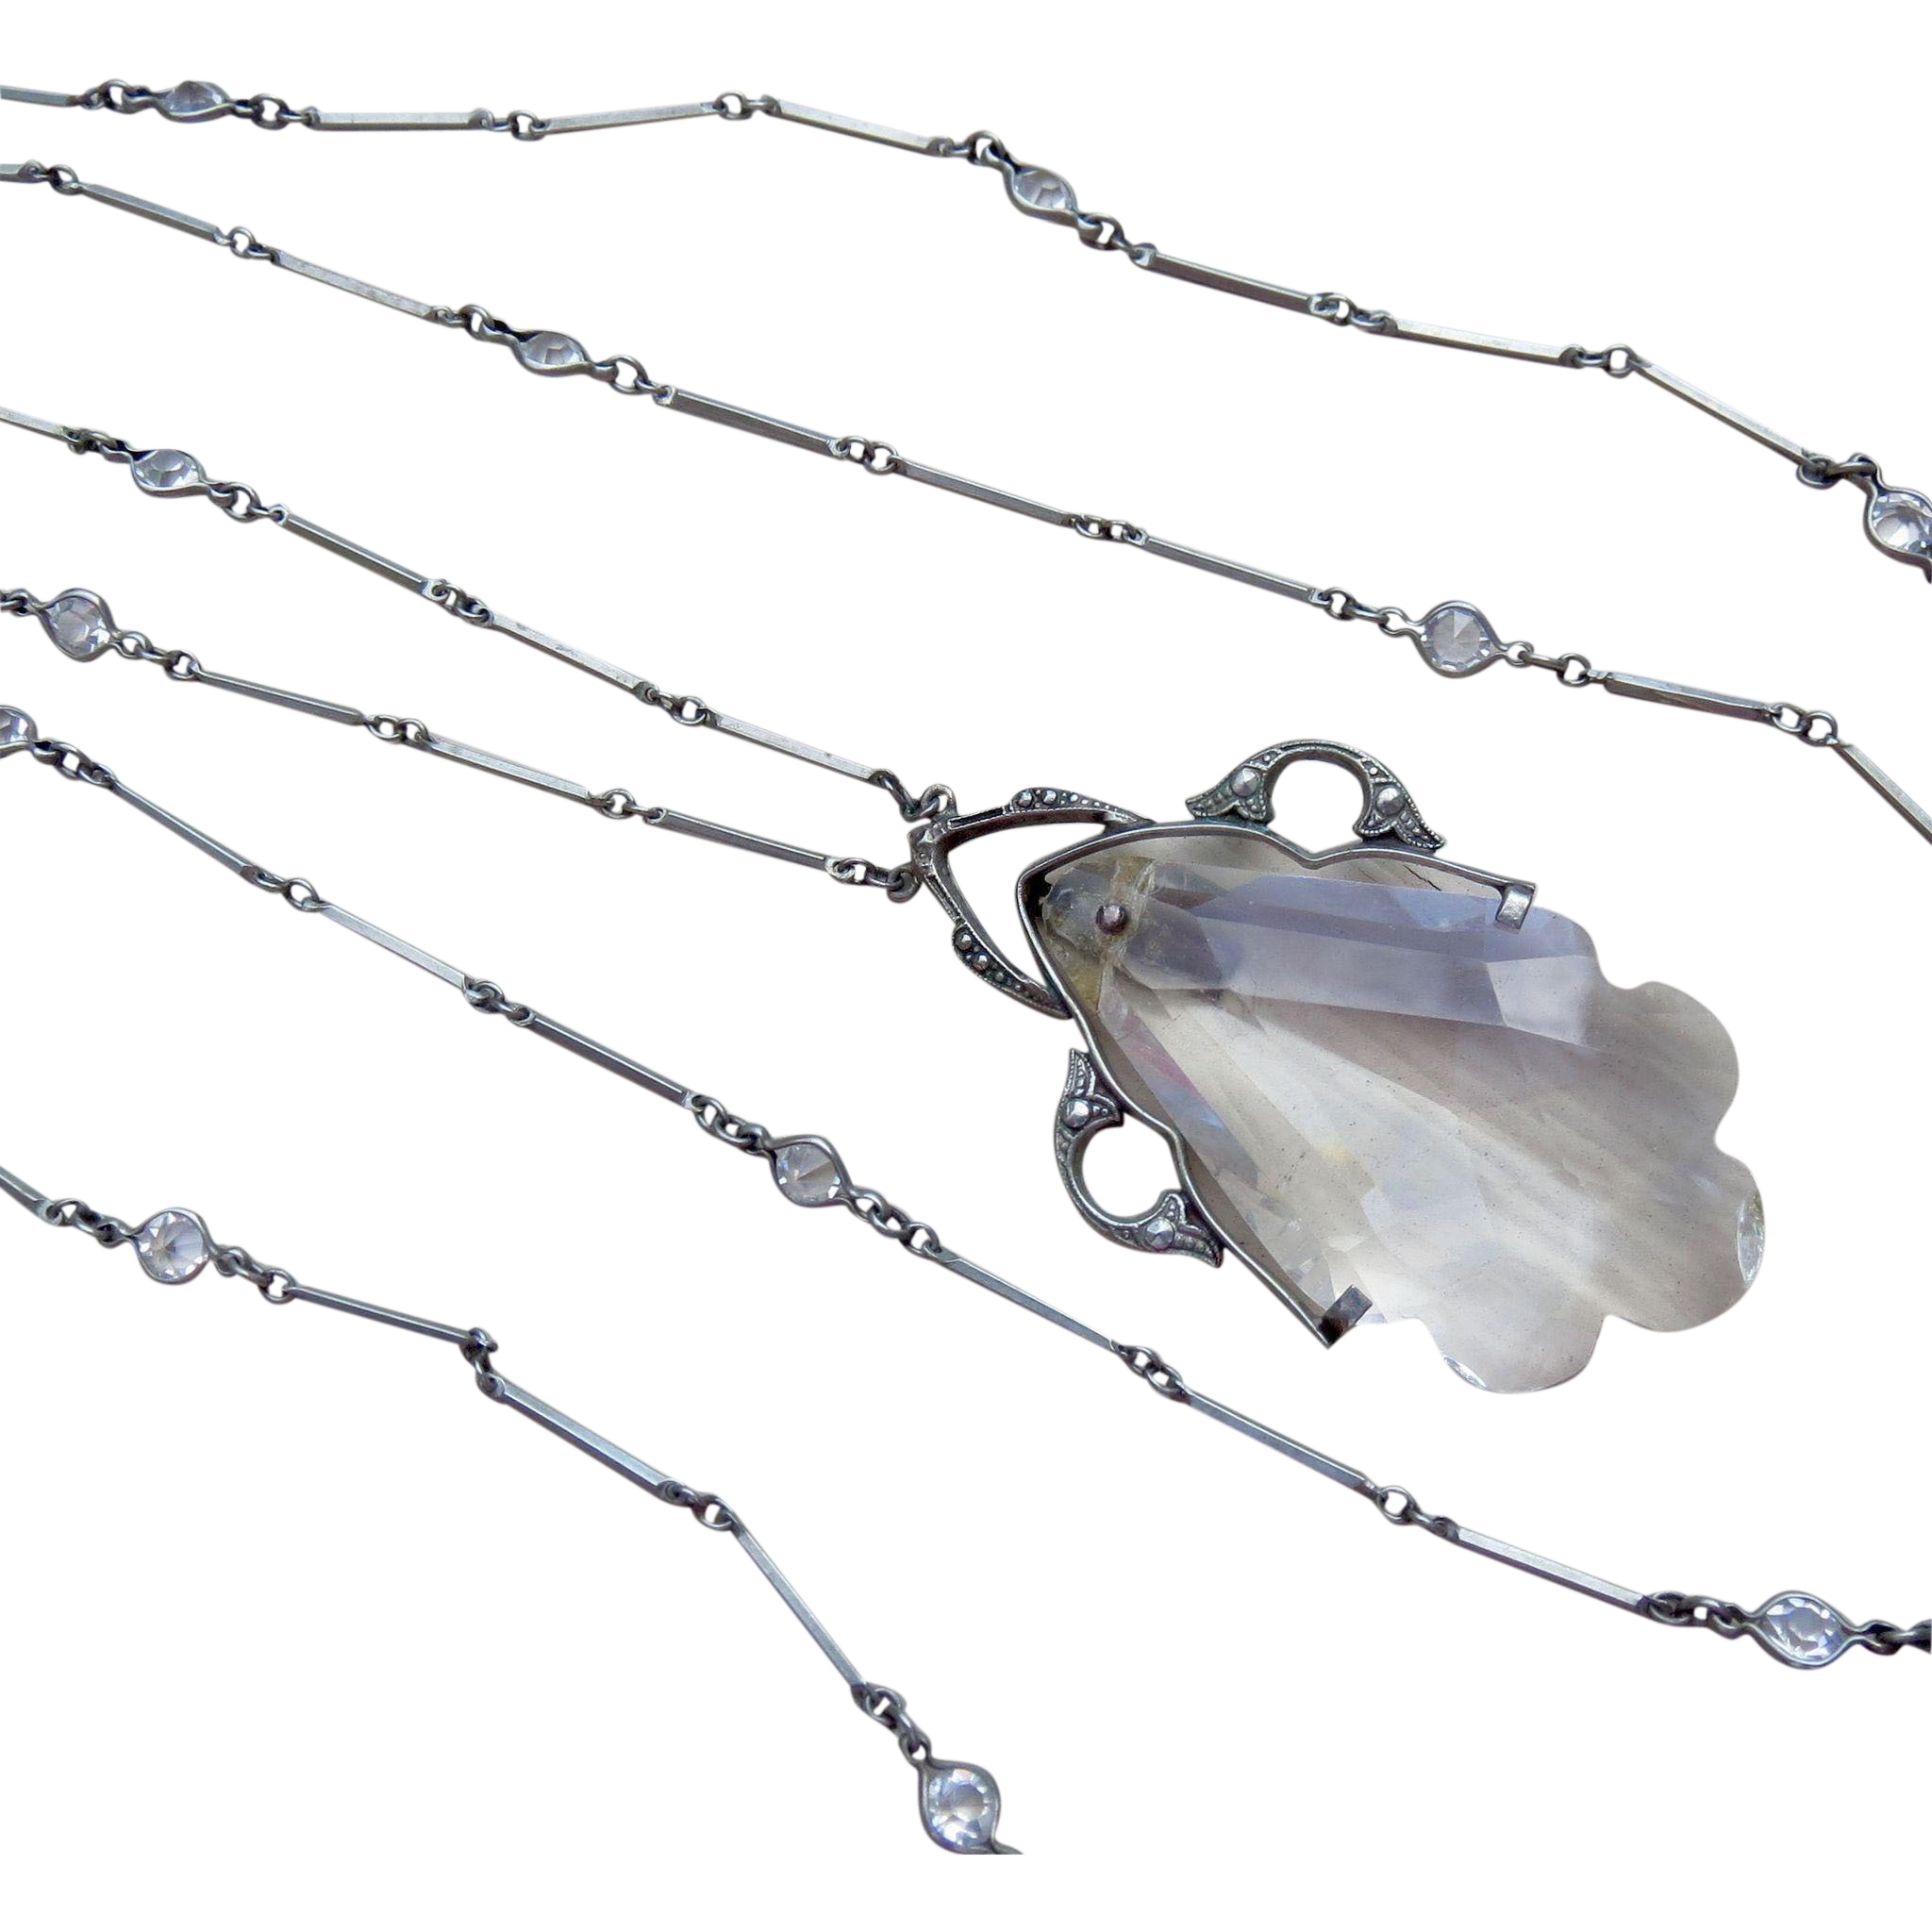 "Art Deco Bezel Set Paste and Crystal Drop Necklace 42"" Flapper"